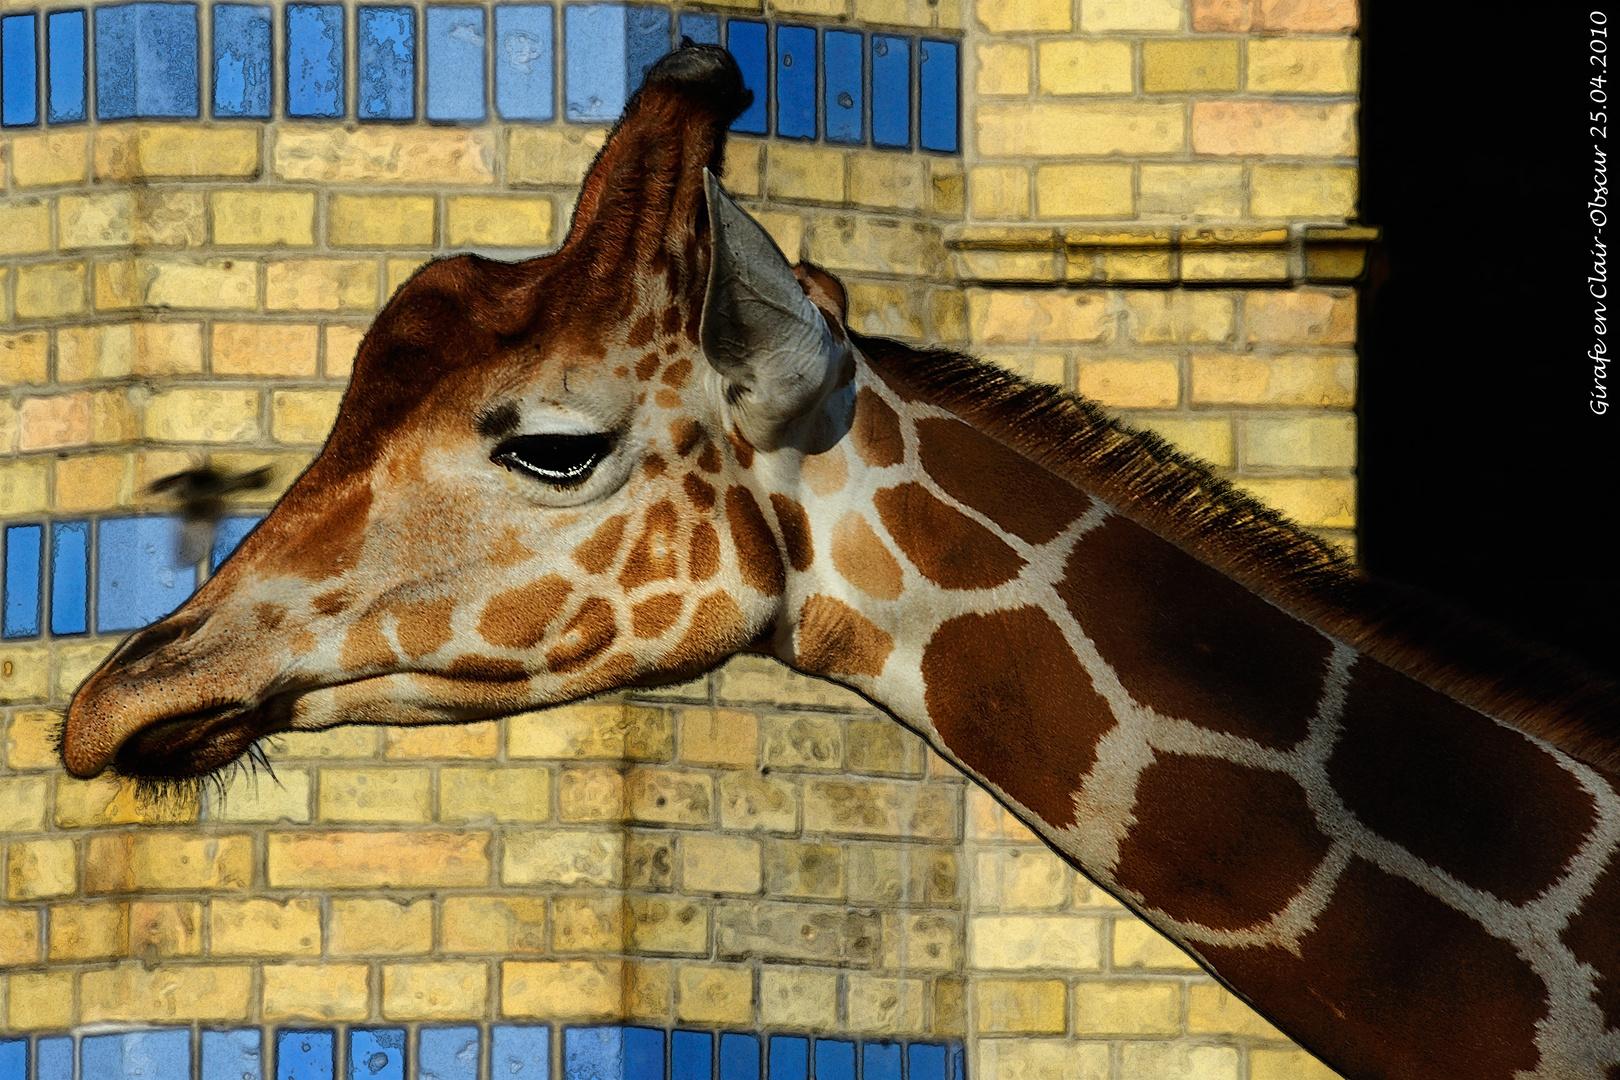 Girafe en Clair-Obscur (25.04.2010)